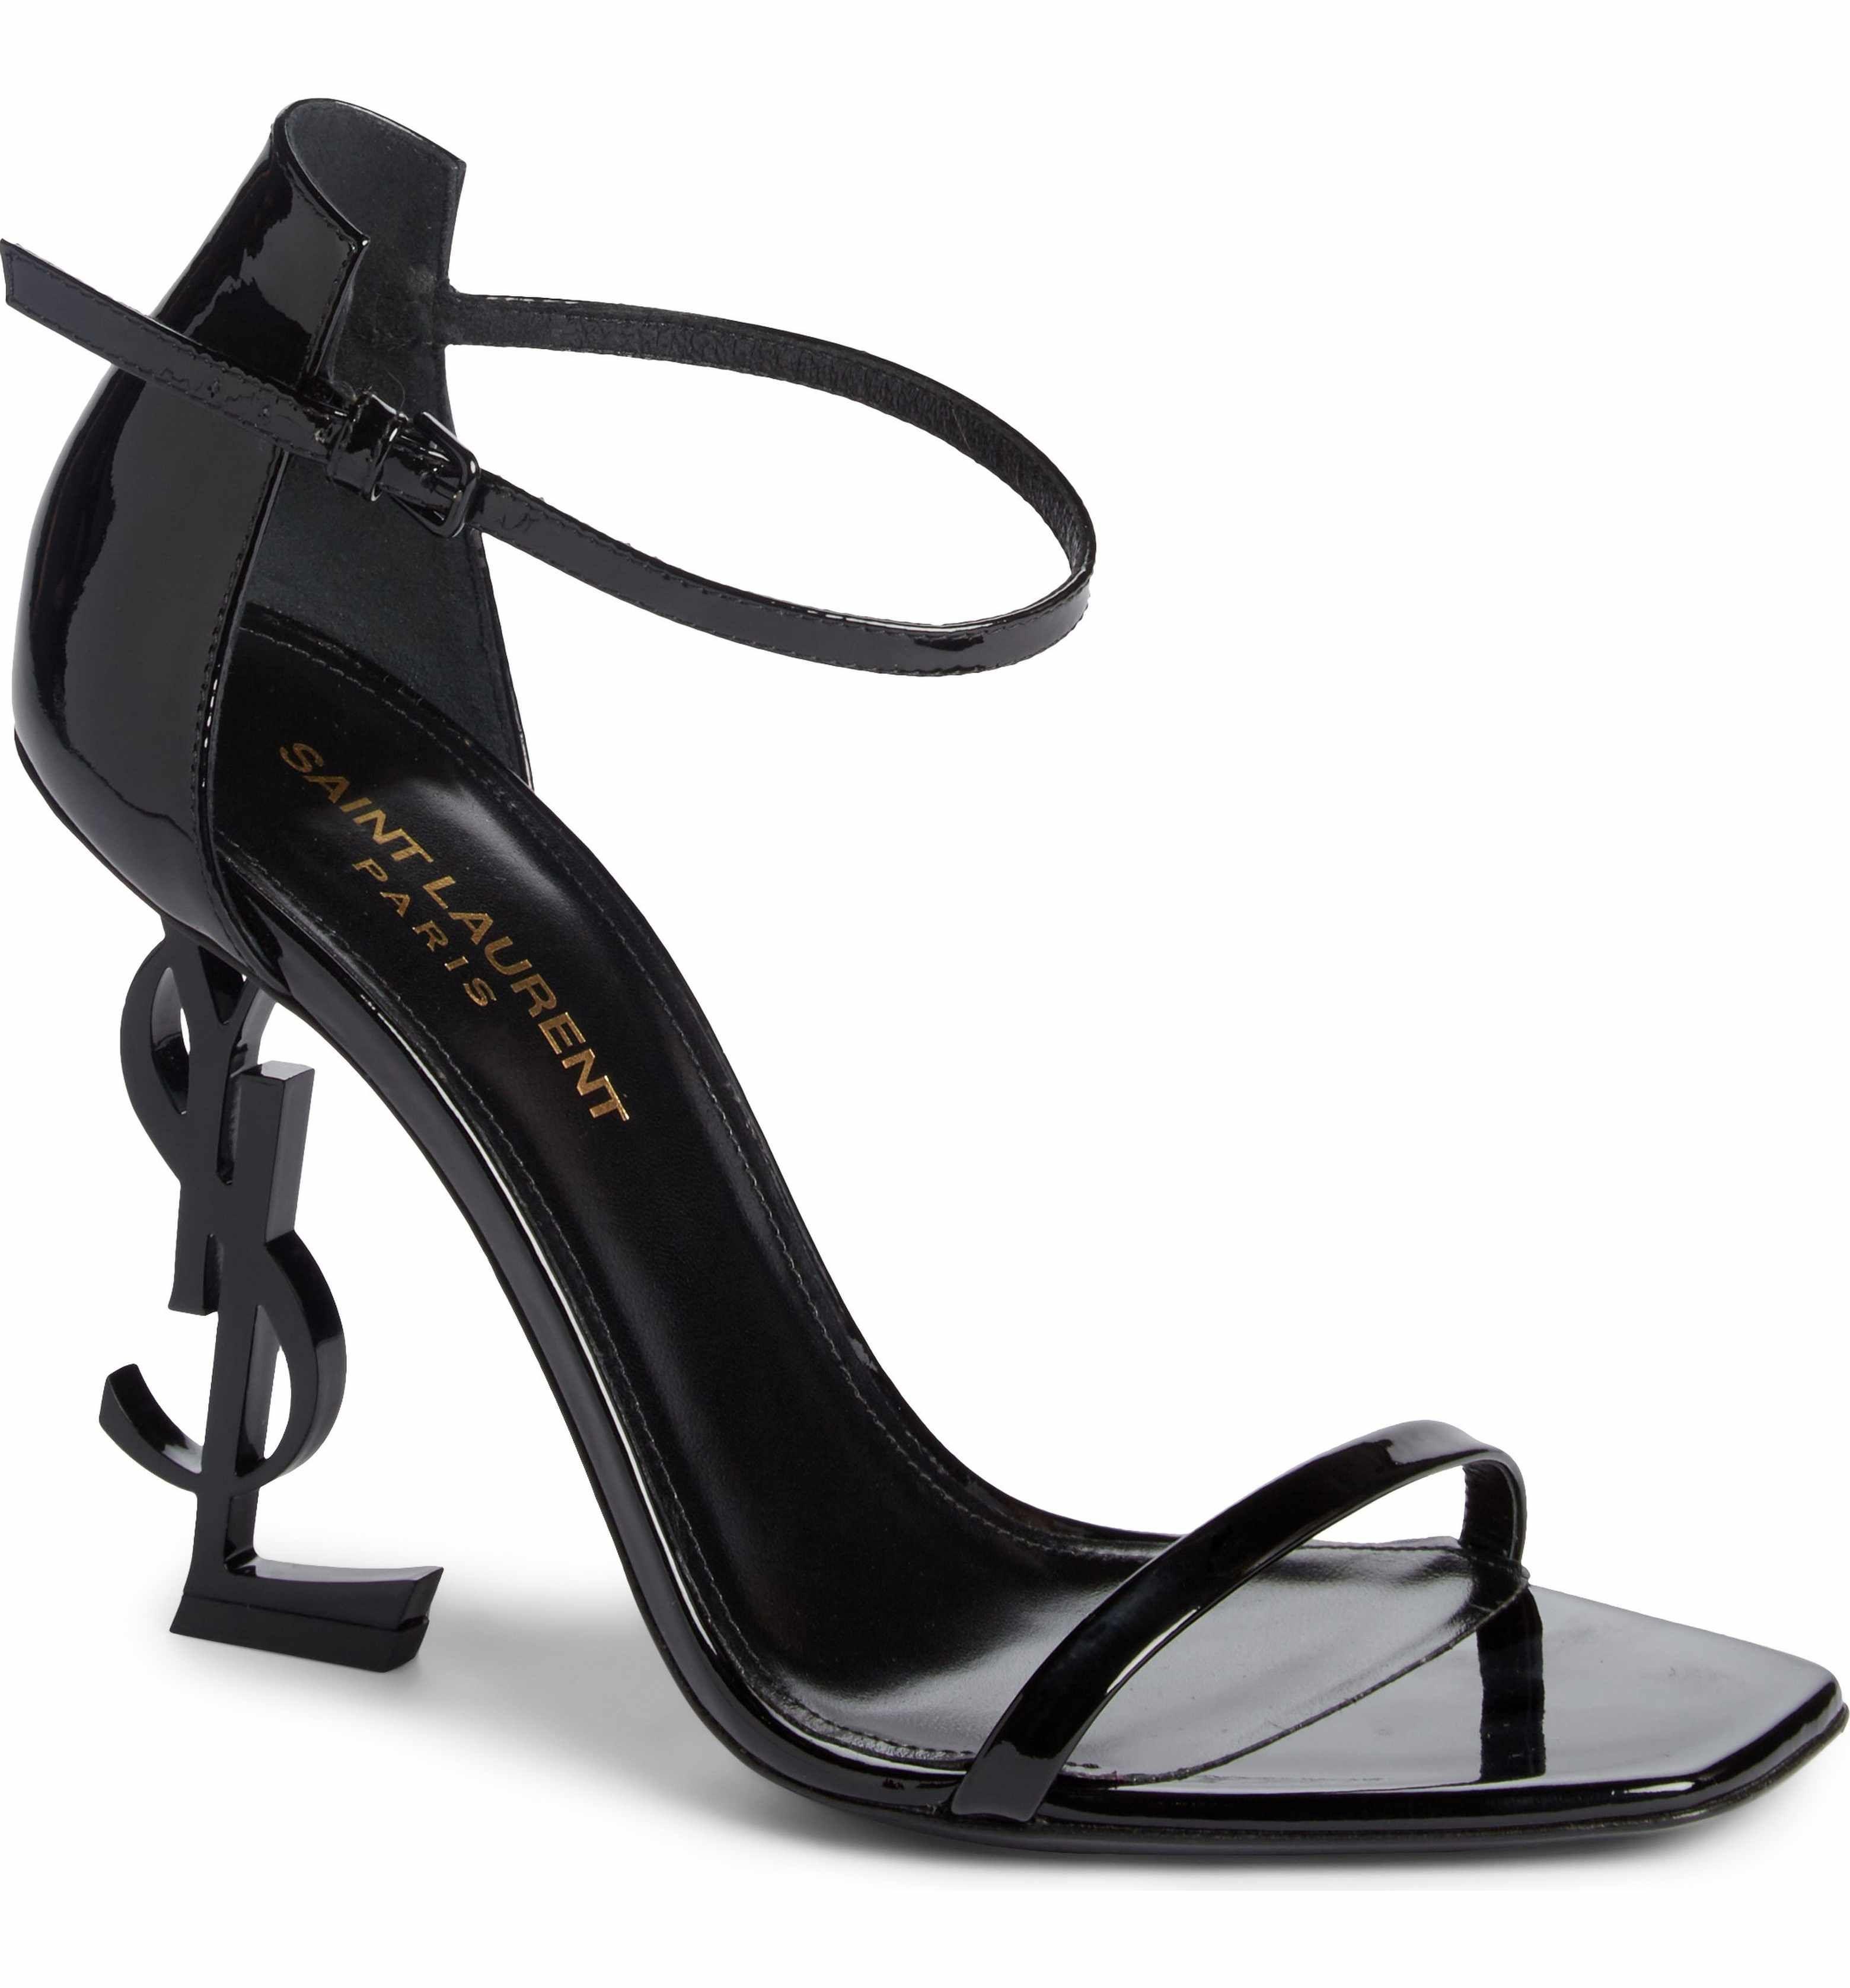 dfd6624ccfdf Main Image - Saint Laurent Opyum YSL Ankle Strap Sandal (Women ...